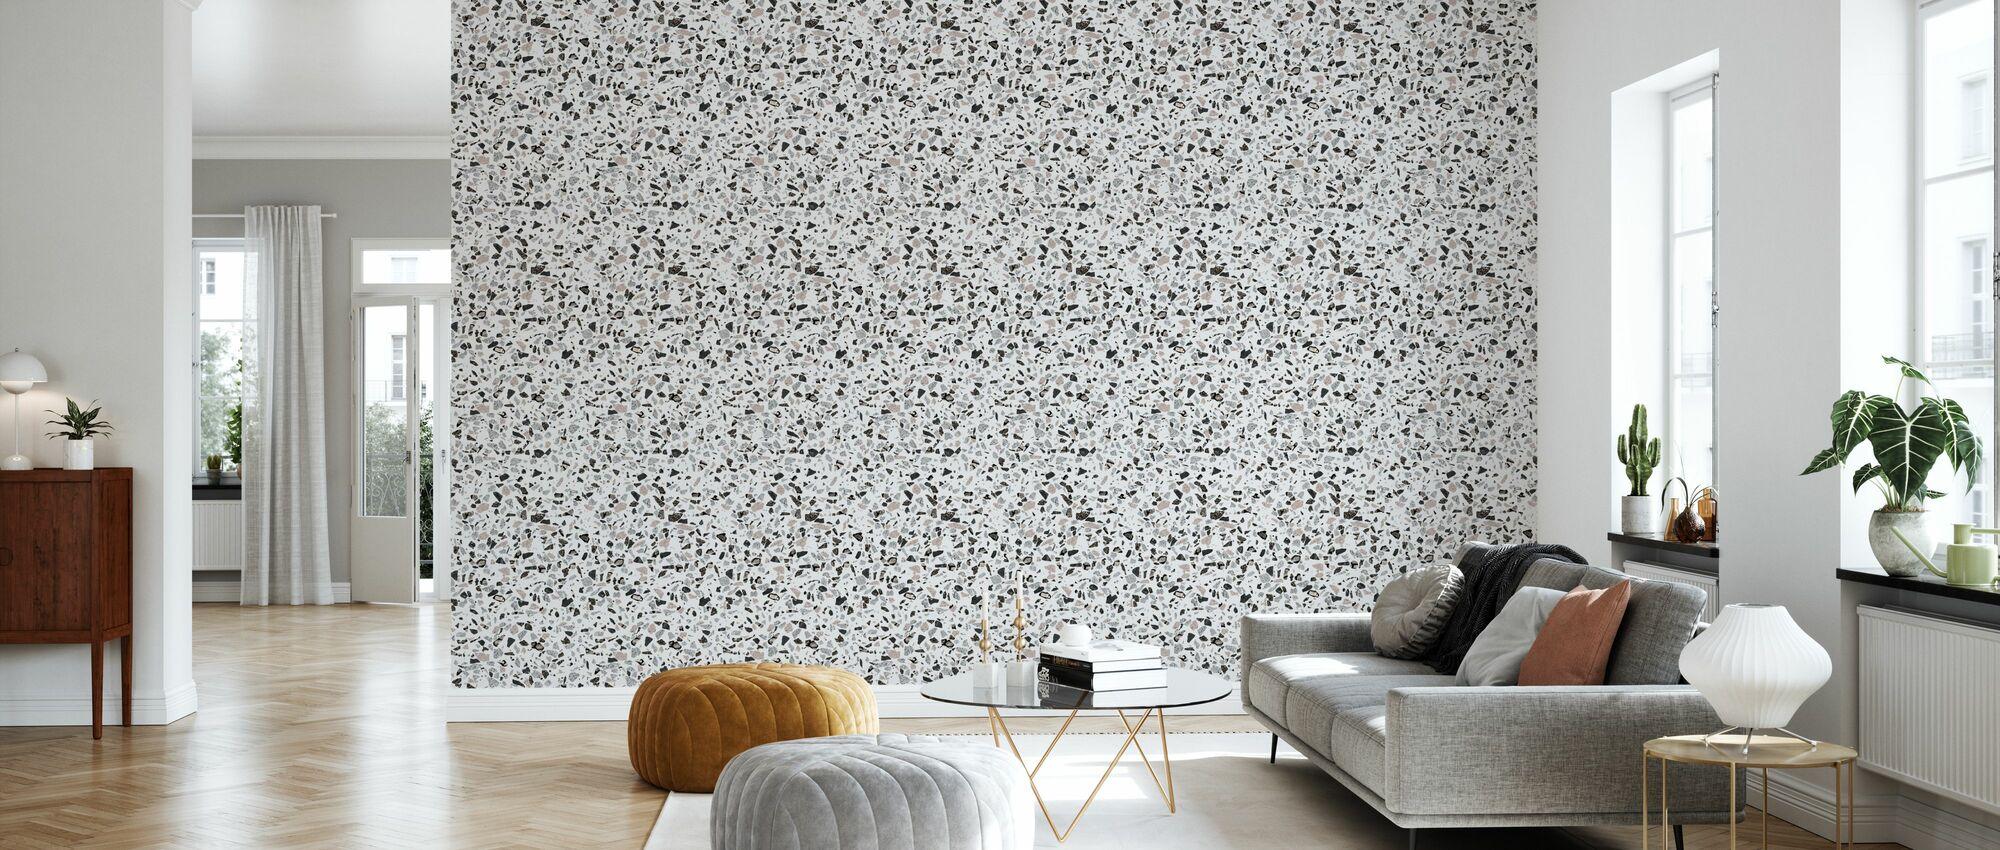 Holy Granite - Grey - Wallpaper - Living Room